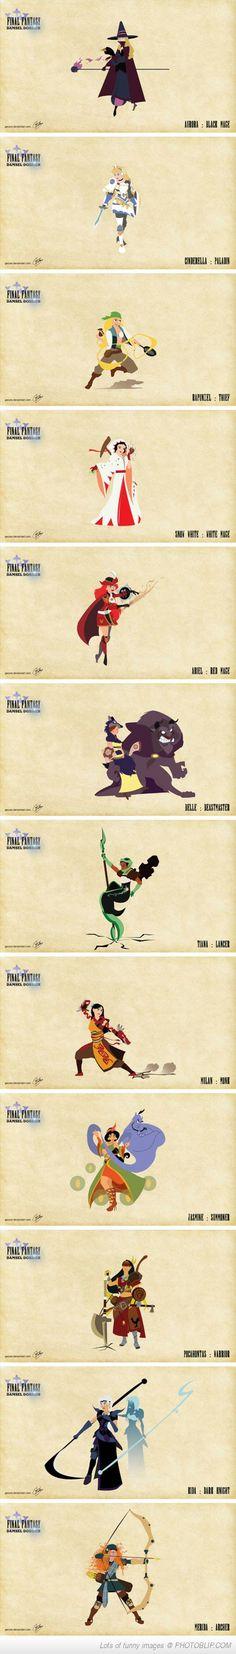 Disney Princesses As Final Fantasy Characters